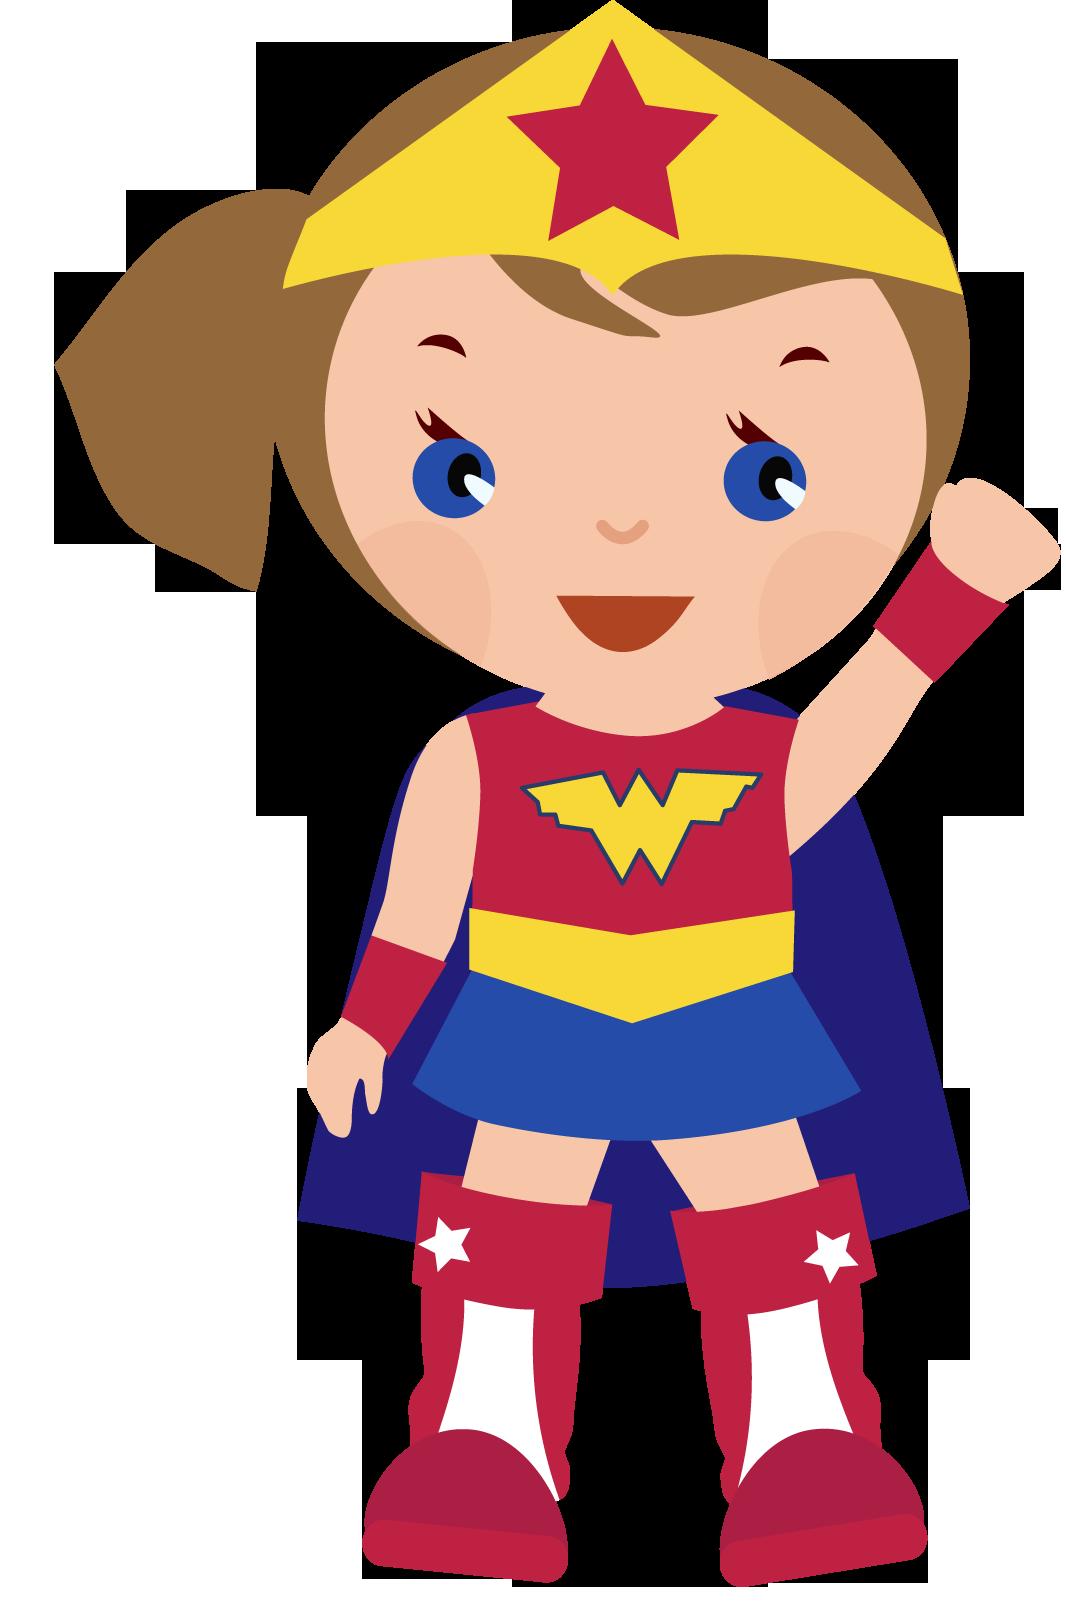 Workbooks superhero worksheets for preschool : Superhero Printables | Superhero, Superhero party and Clip art